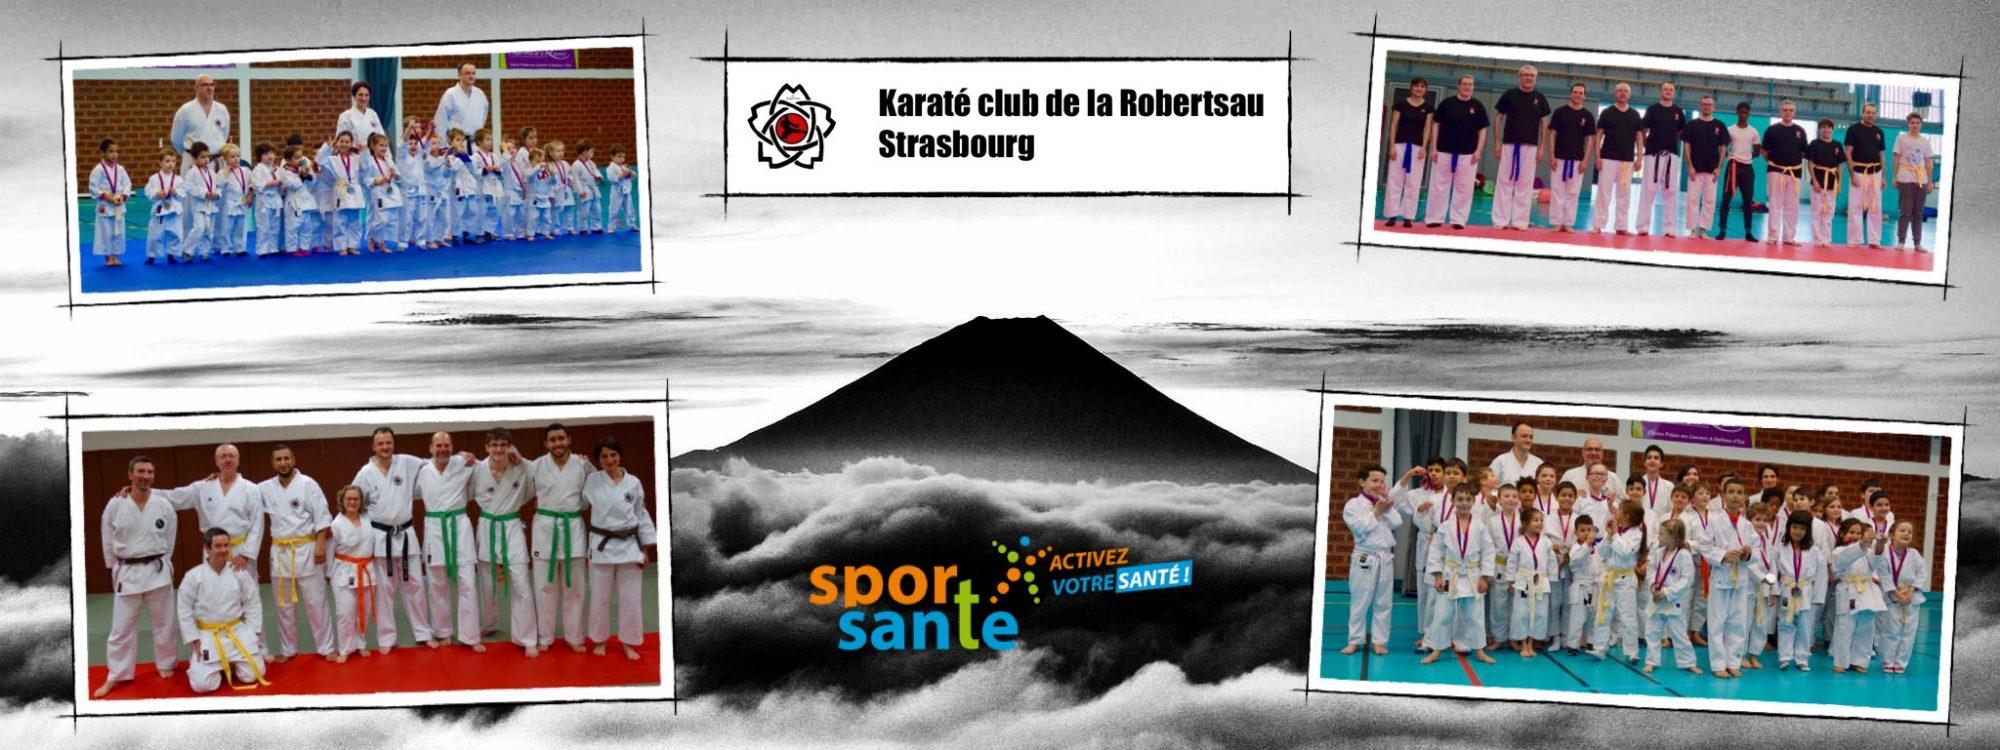 Karaté club de la Robertsau